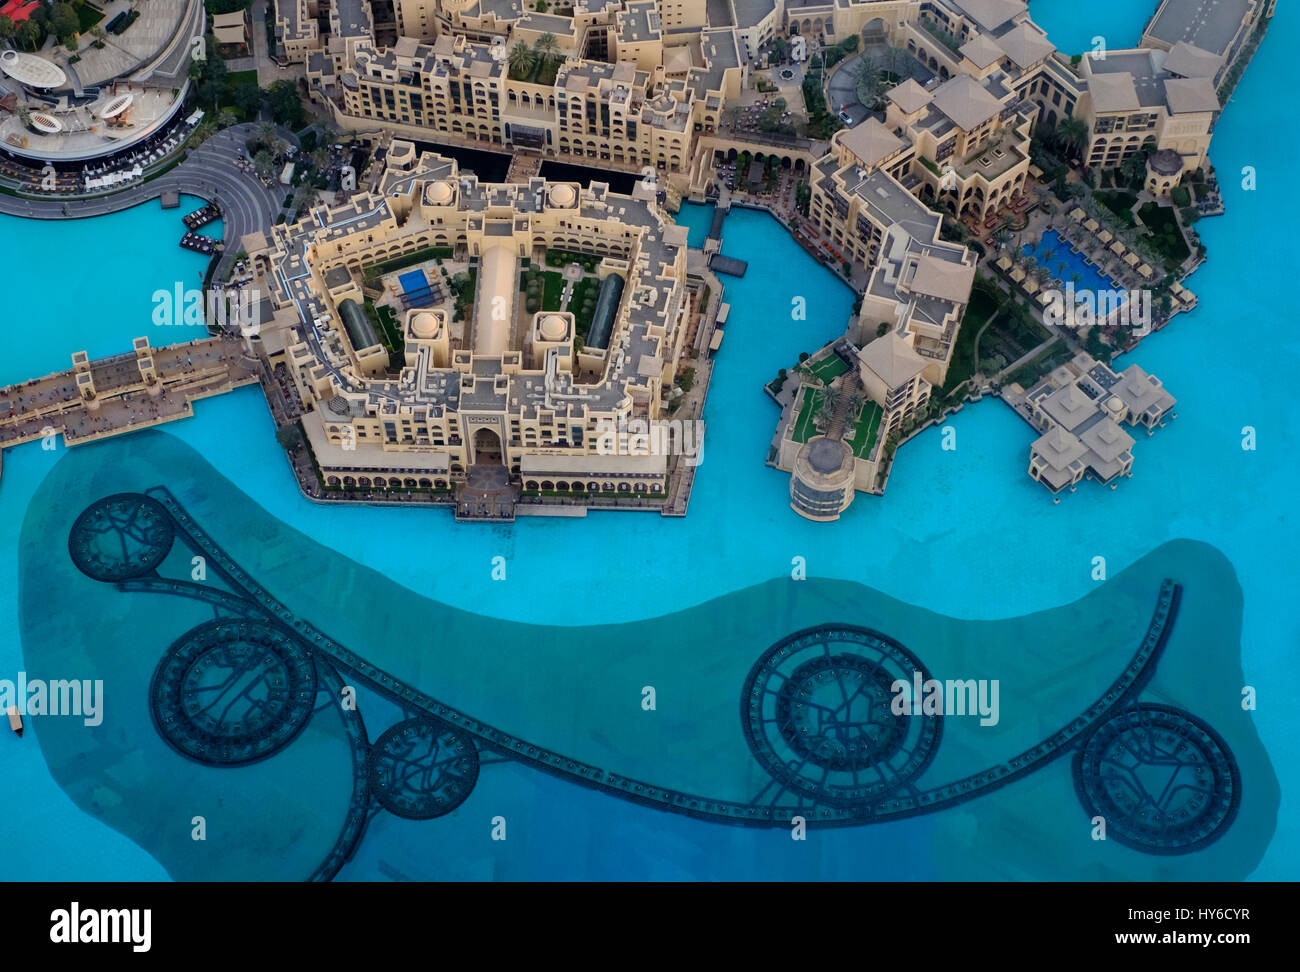 UNITED ARAB EMIRATES, DUBAI - CIRCA JANUARY 2017: The Dubai Fountain and Burj Khalifa Lake as seen from the Burj - Stock Image